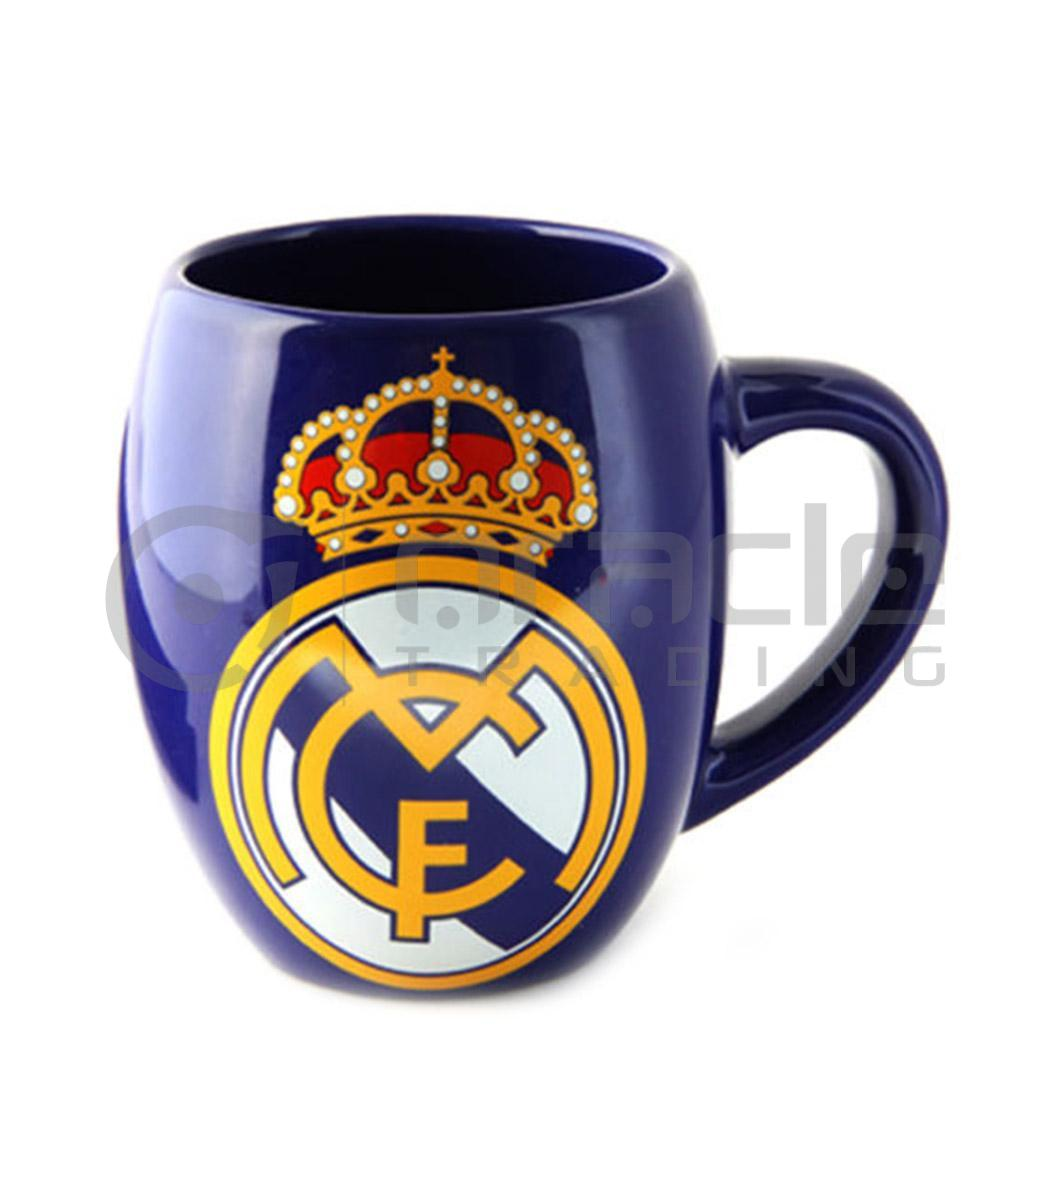 Real Madrid Tub Mug (Boxed)